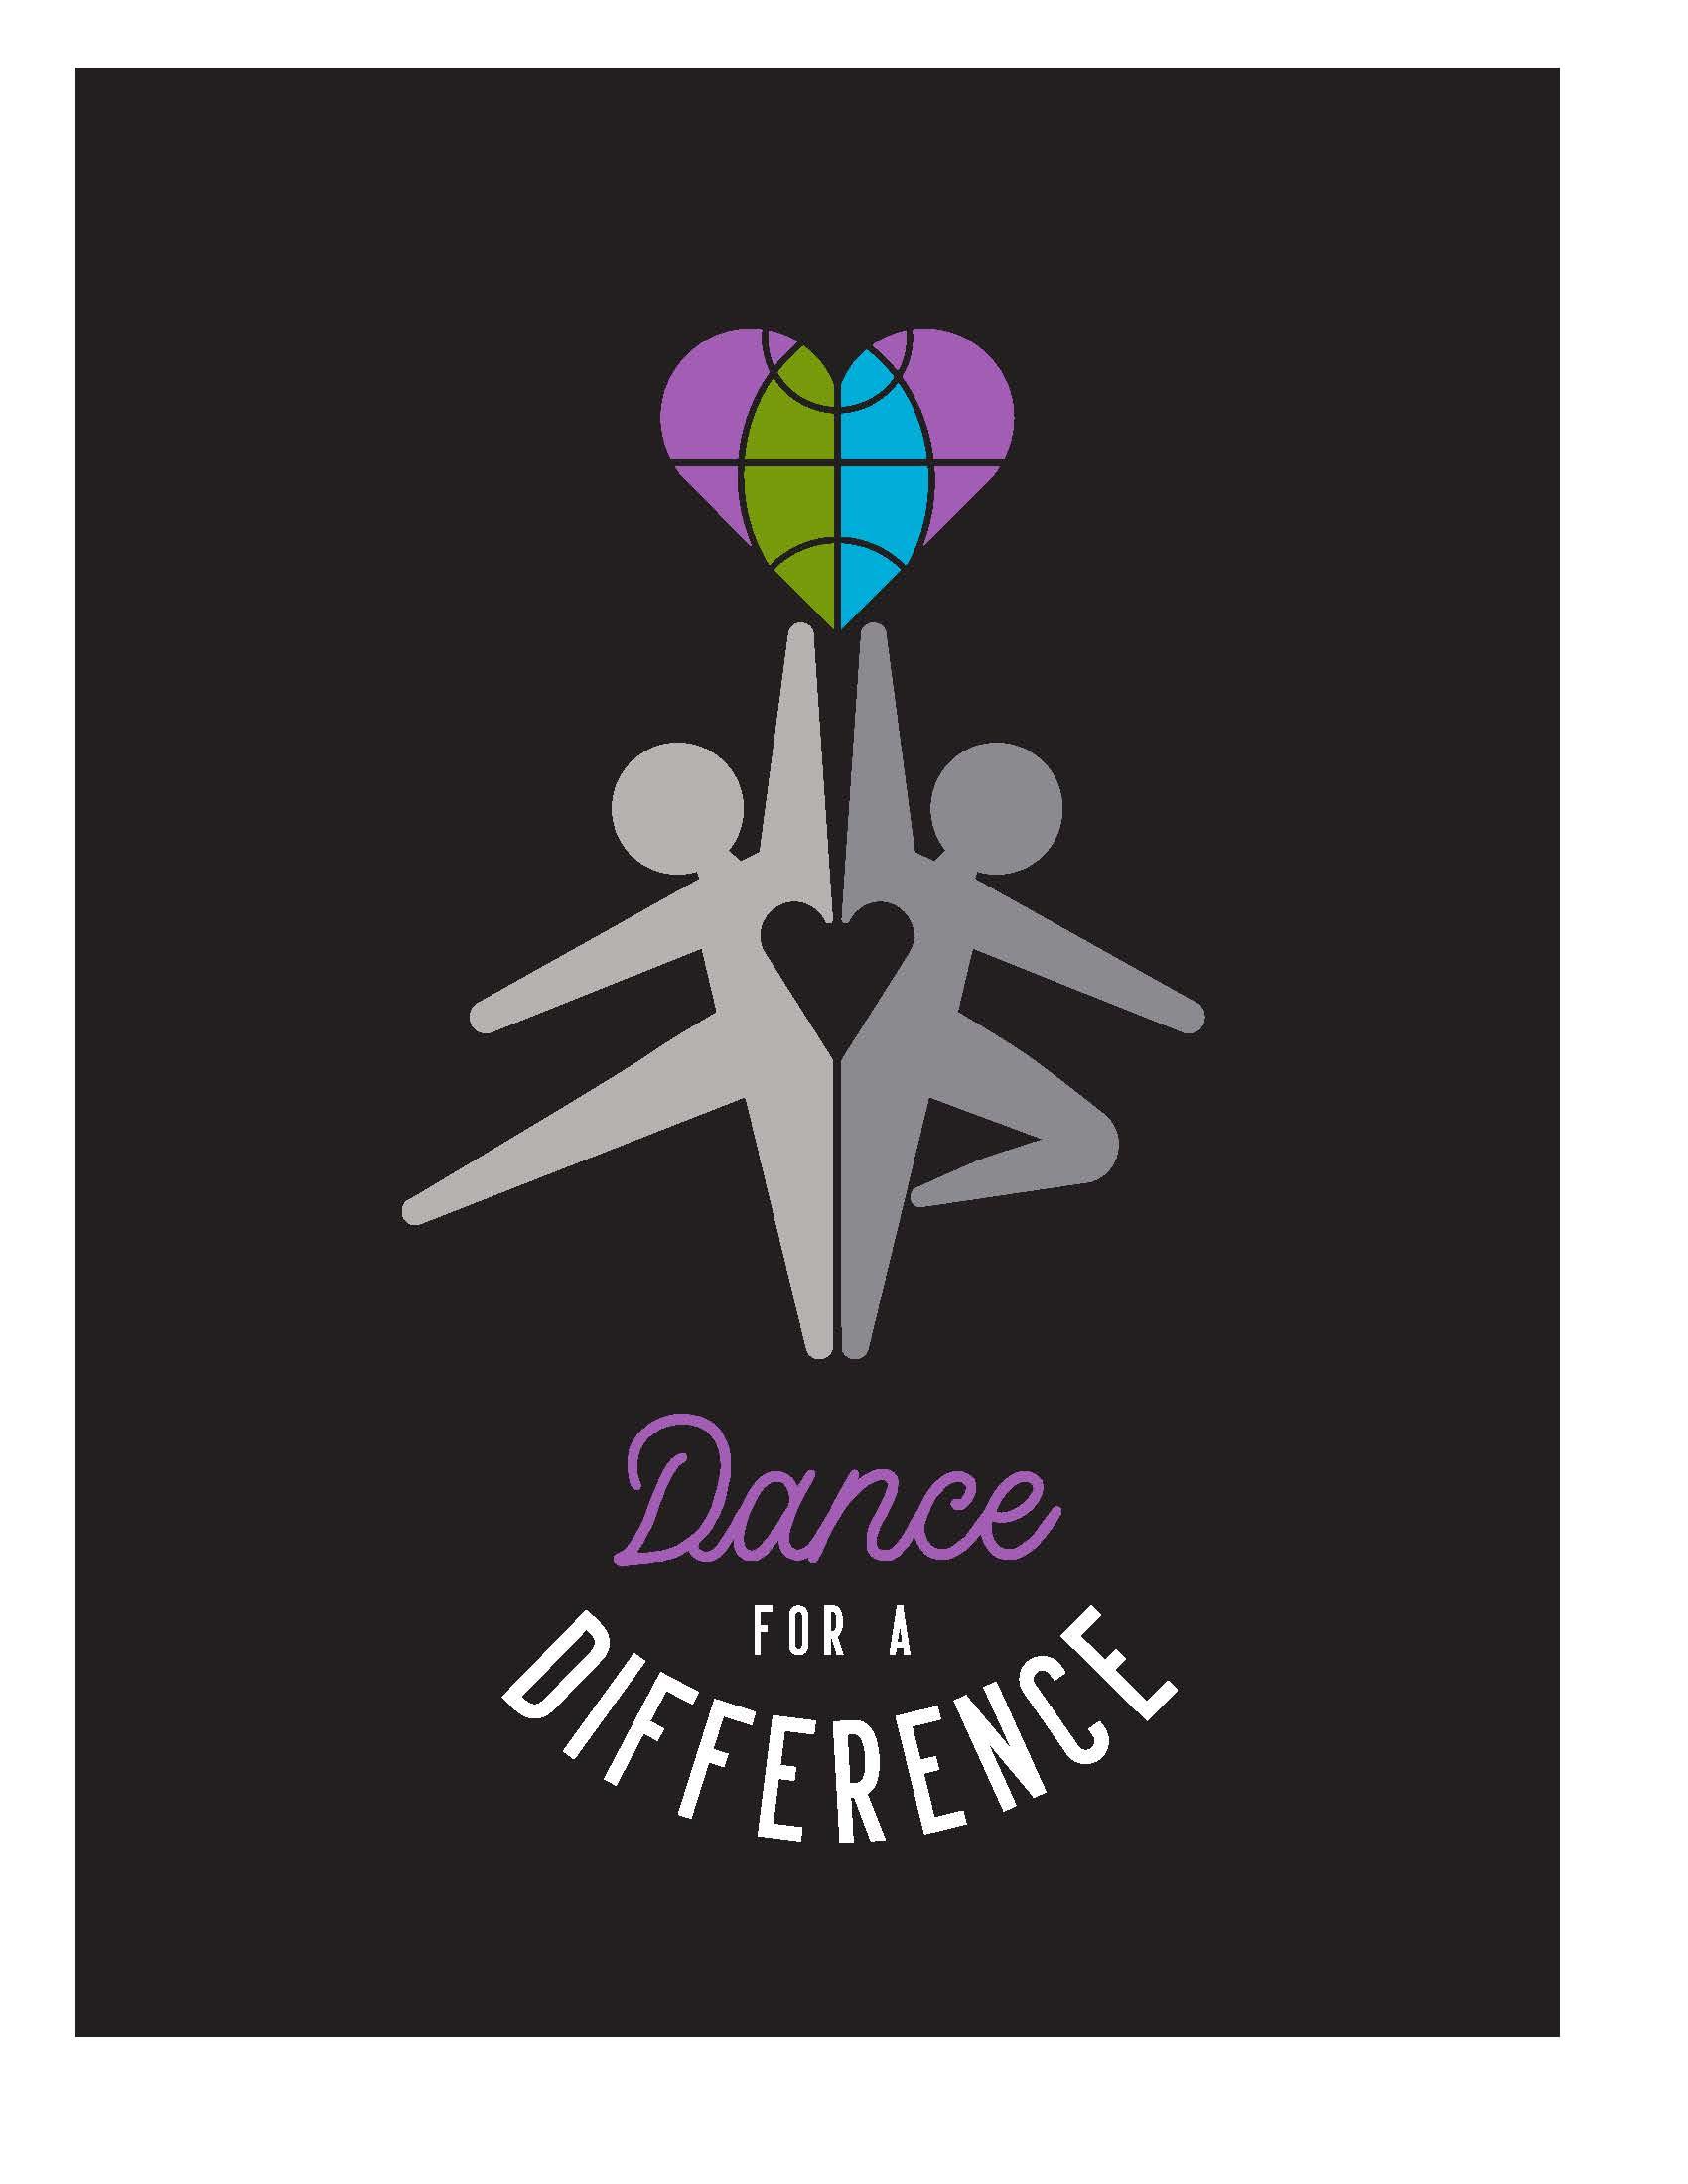 DanceForDifferencLogo_FINAL_TshirtPrint_Page_1.jpg